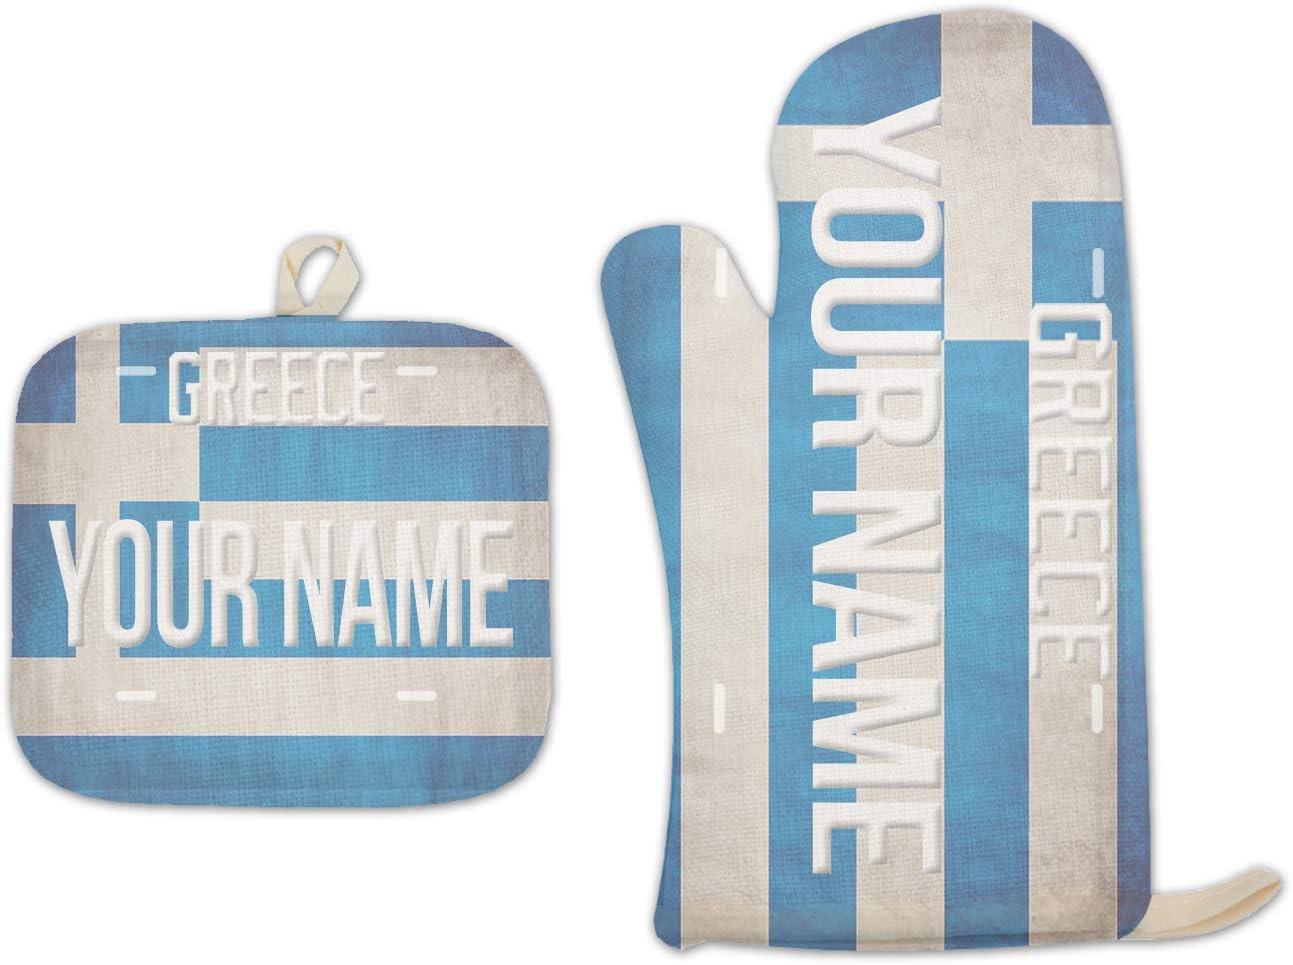 Bleu Reign BRGiftShop Personalized Custom Name License Greece Plate Linen Oven Mitt and Potholder Set